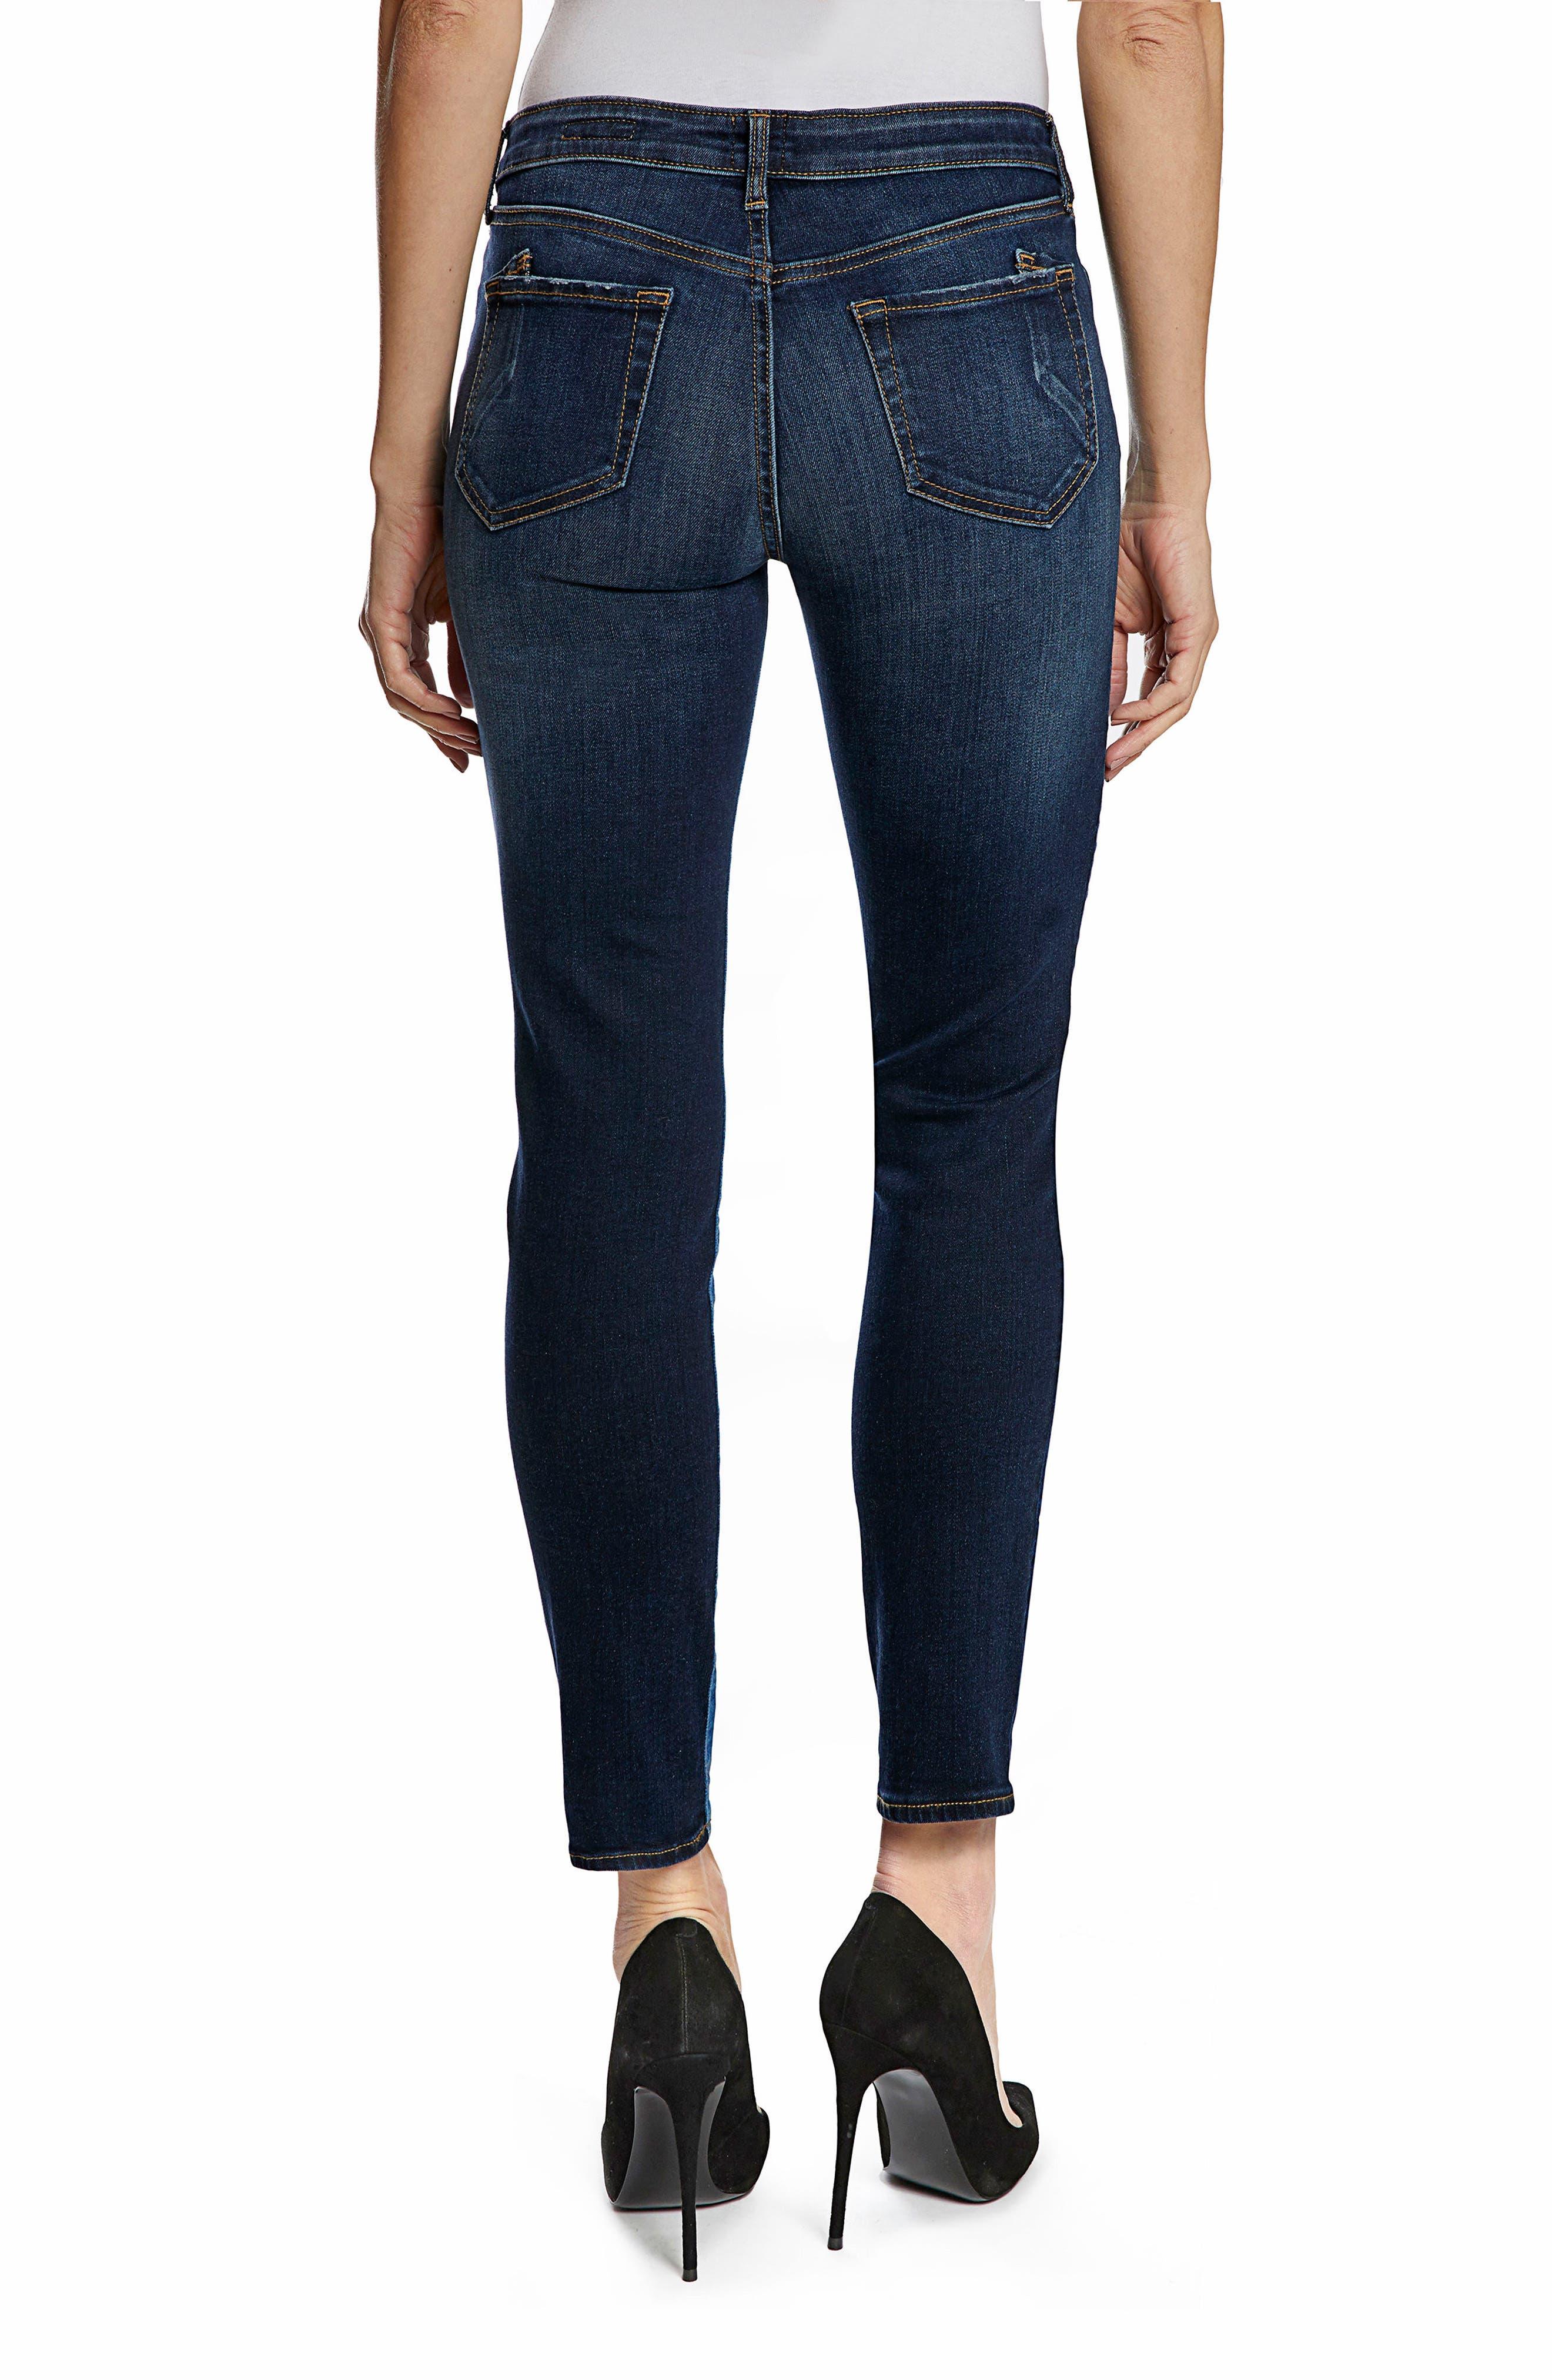 Camaro Ankle Skinny Jeans,                             Alternate thumbnail 2, color,                             Indigo